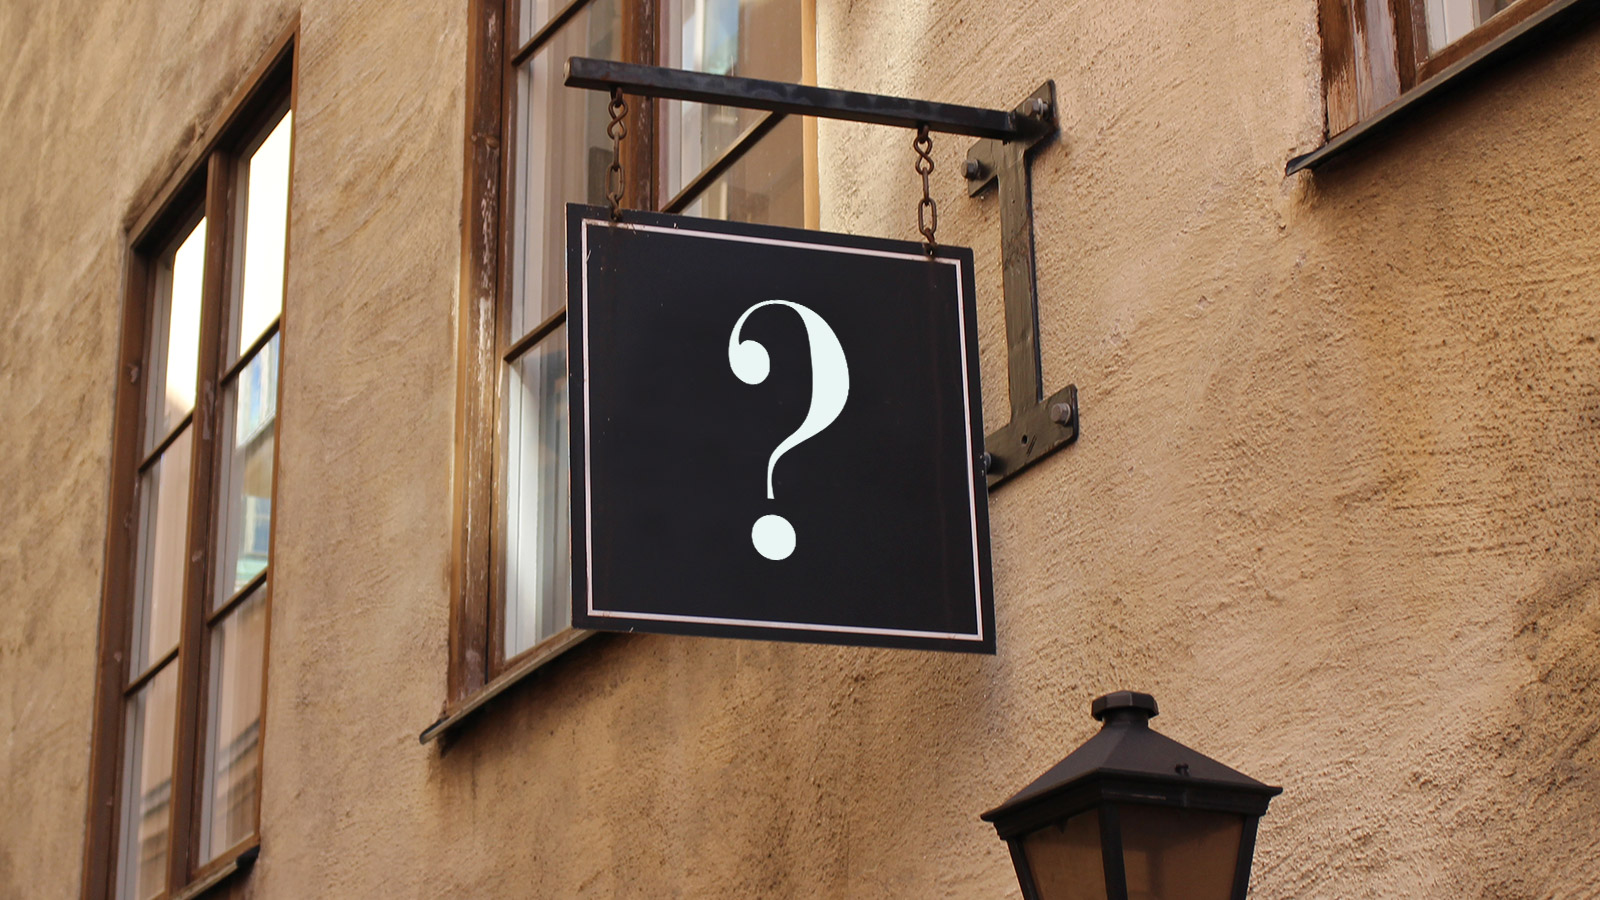 Restaurant naming challenges